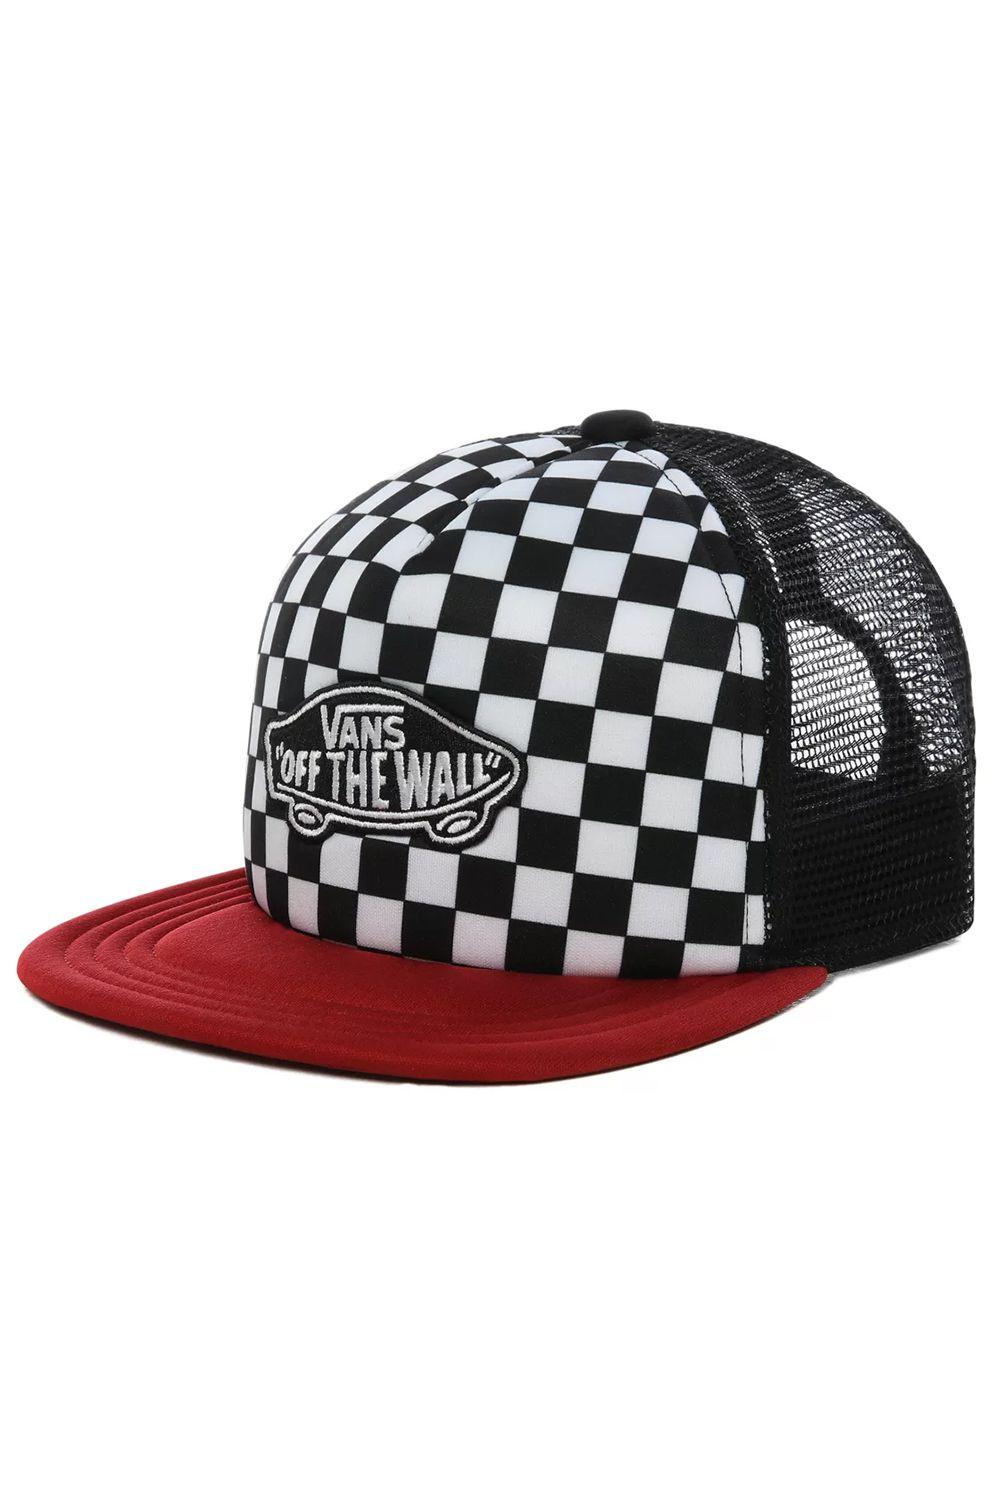 Vans Cap   CLASSIC PATCH TRUCKER PLUS BOYS Chili Pepper/Checkerboard